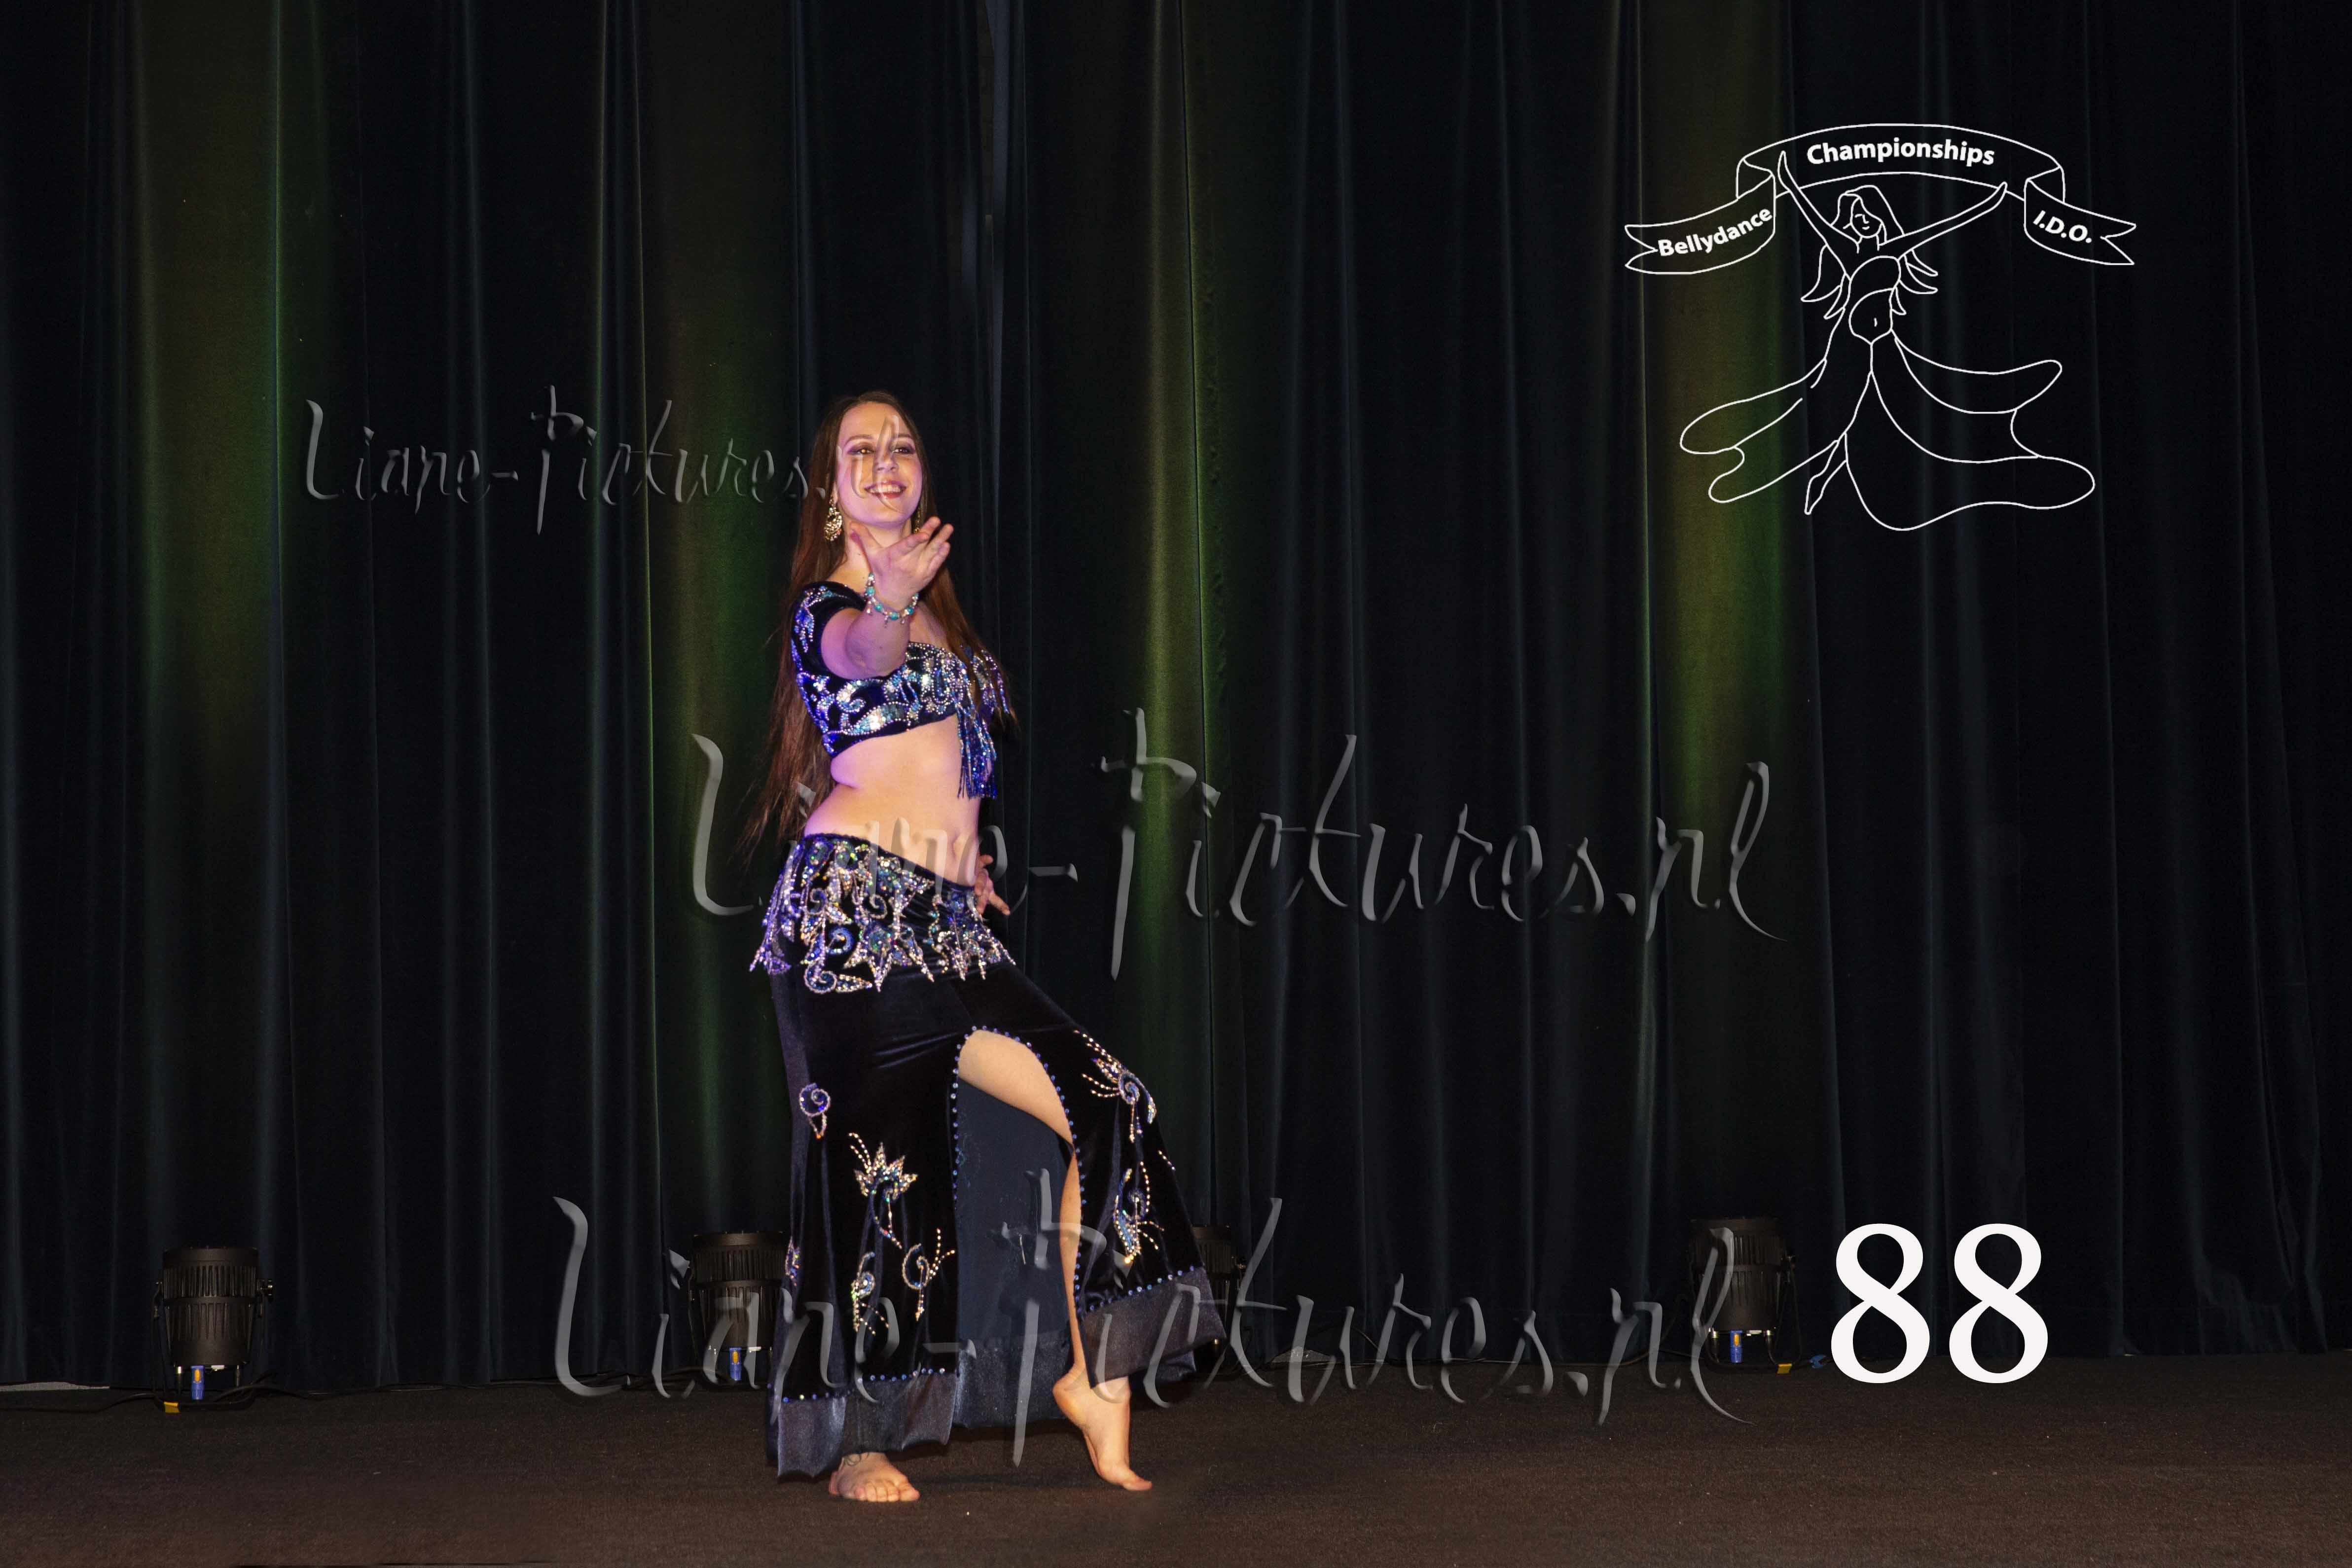 Belly Dance Championship 2019